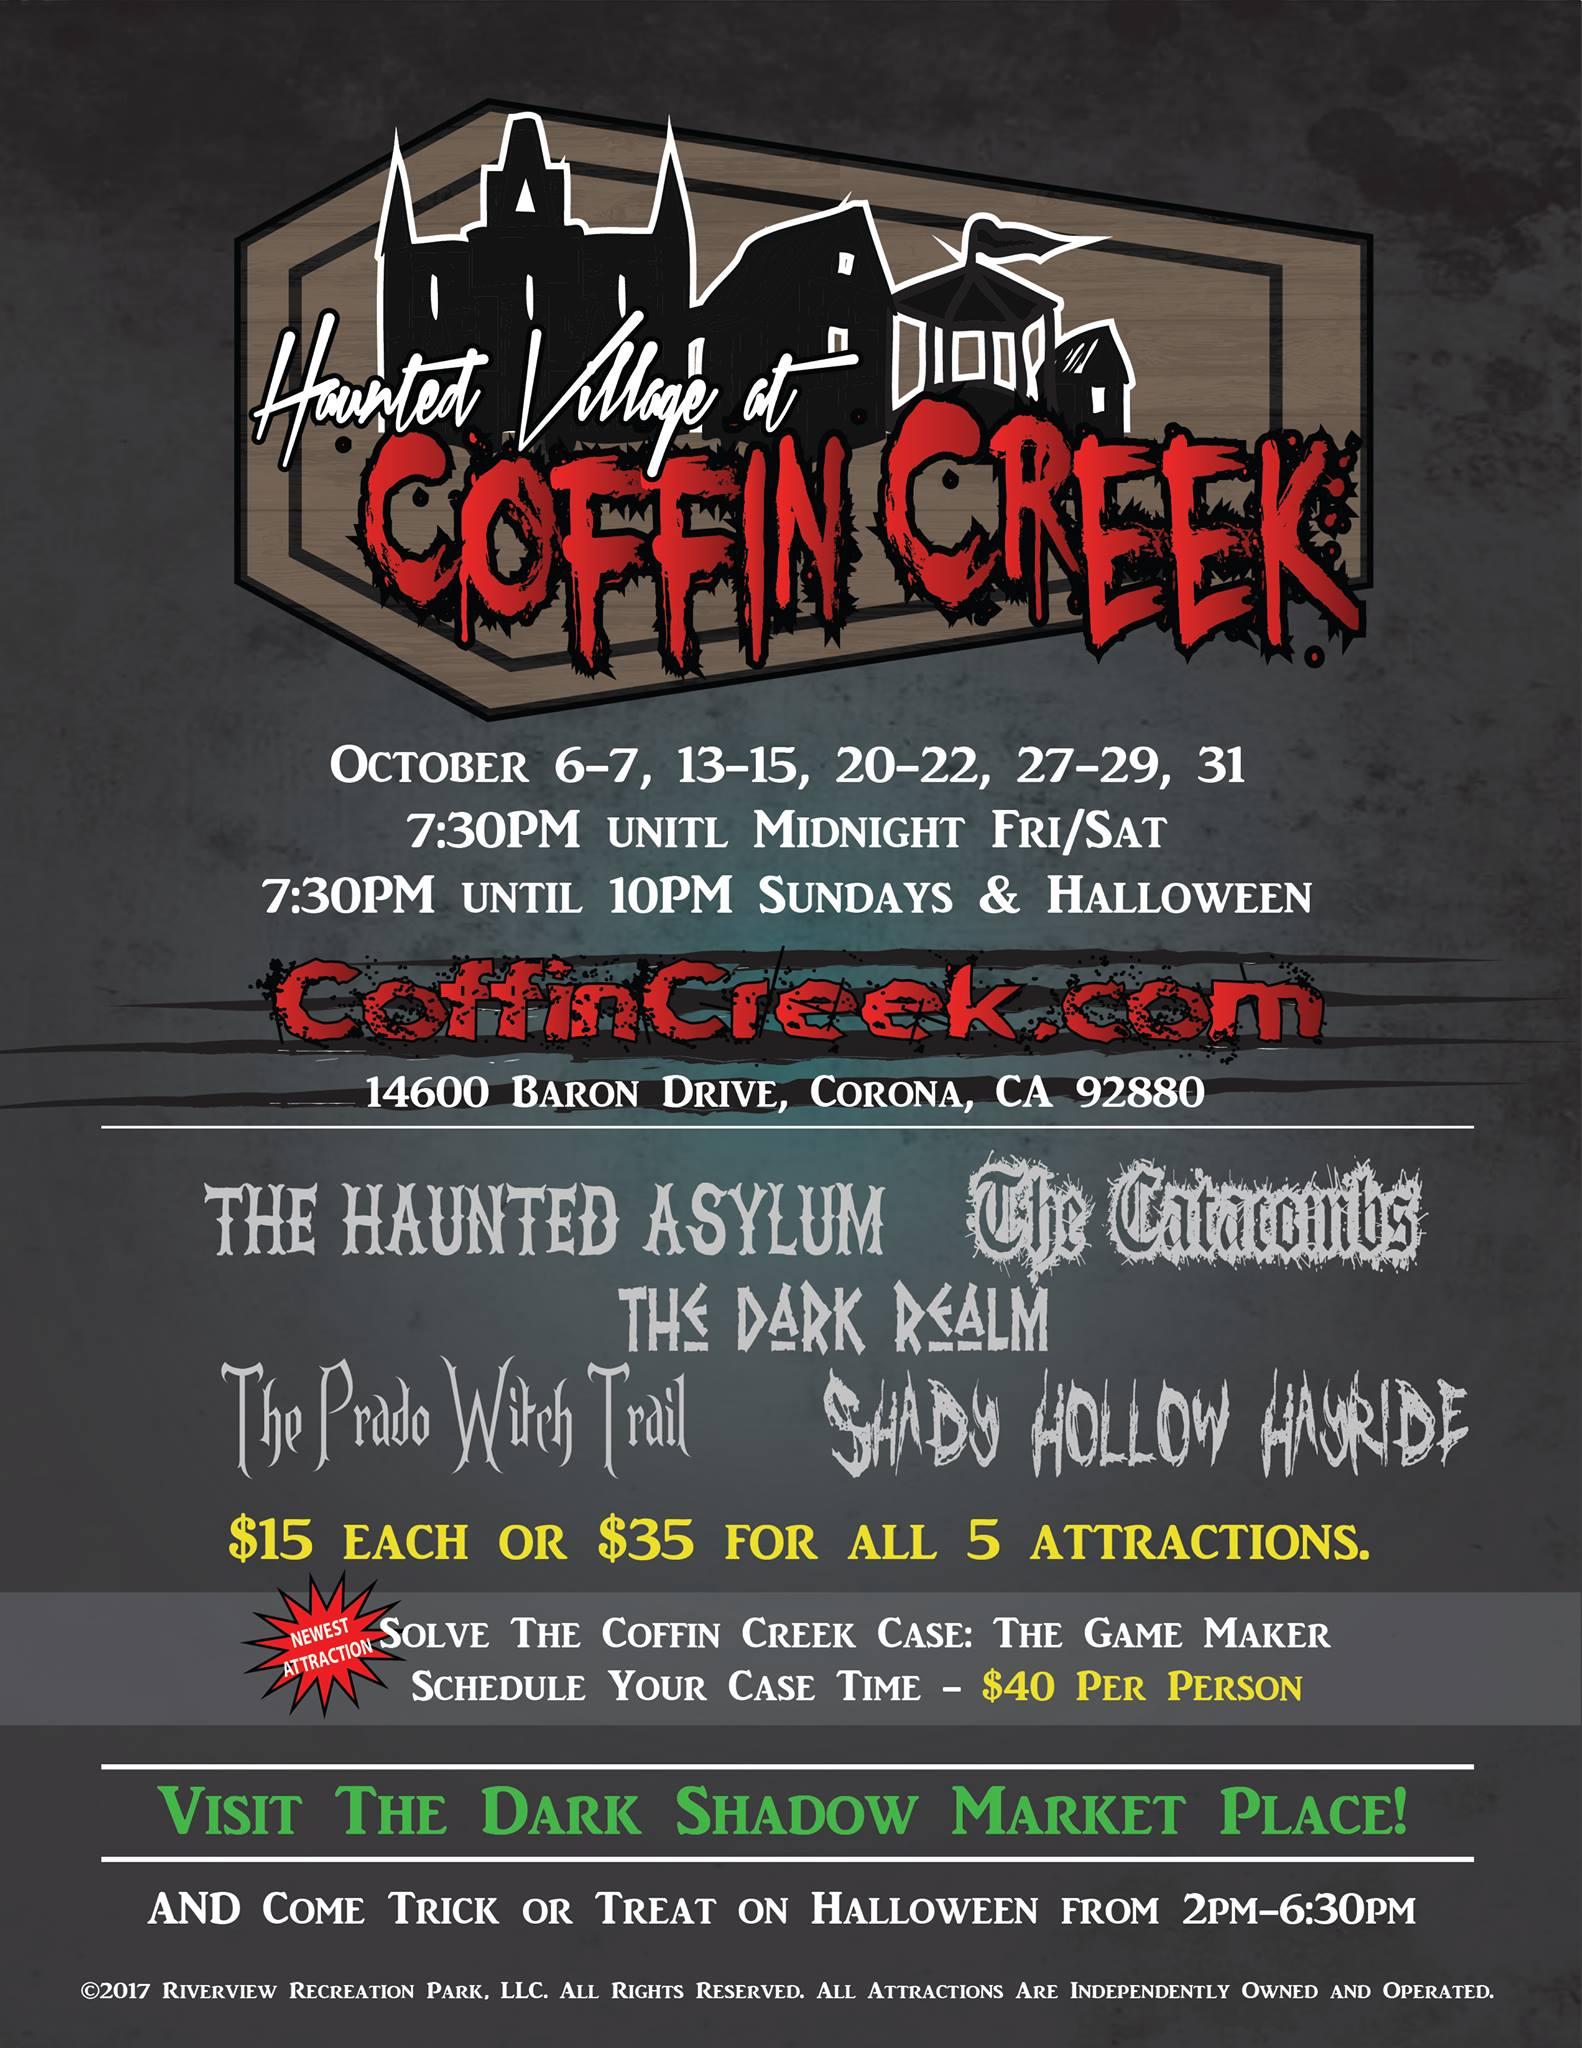 Haunted Asylum at Coffin Creek